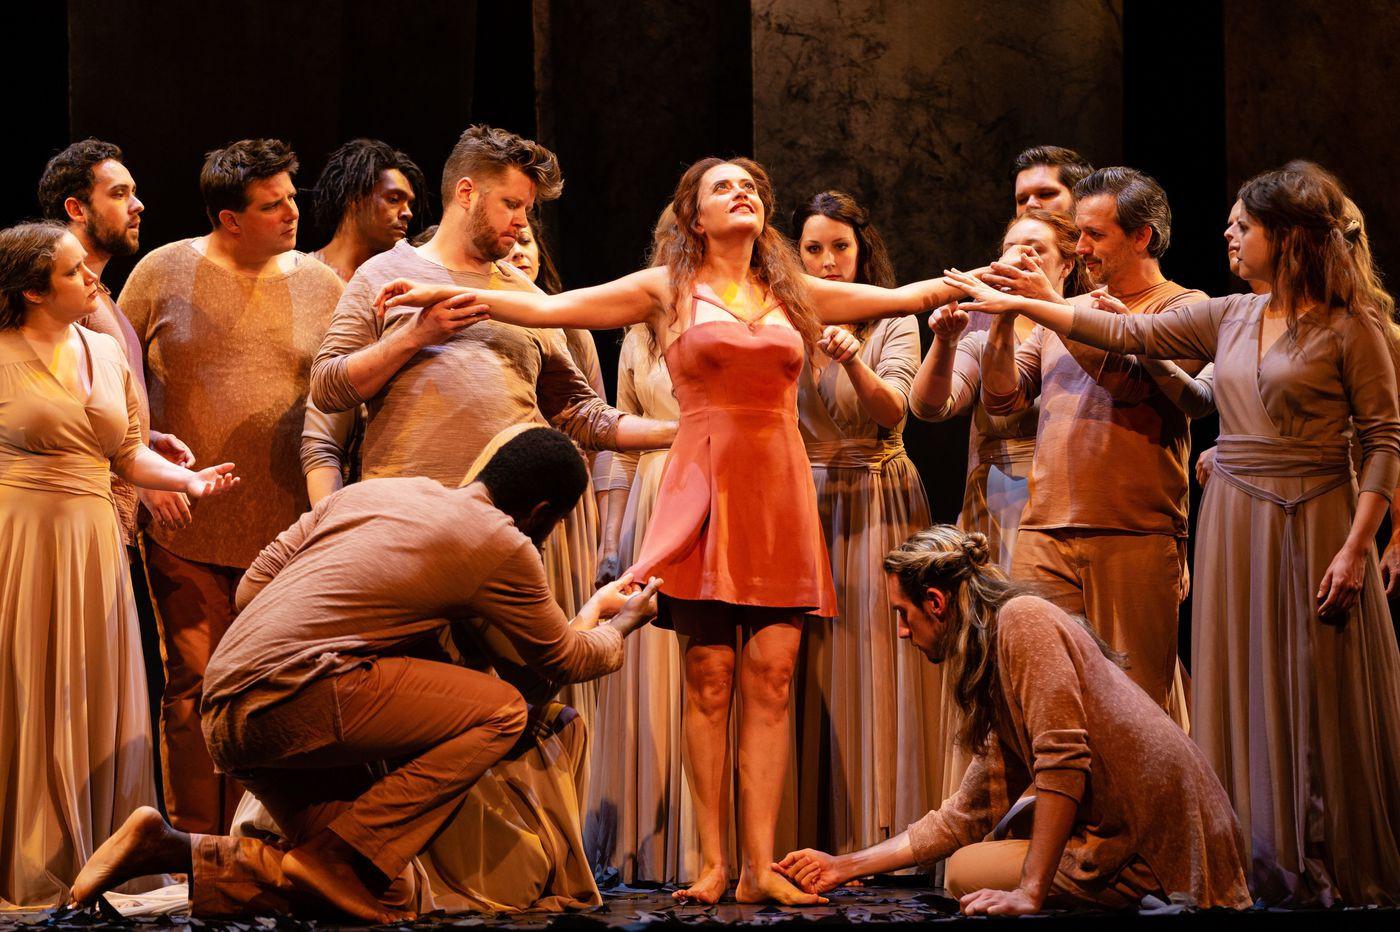 TRT 2'de her salı tiyatro, her cuma Opera ve Senfoni konseri